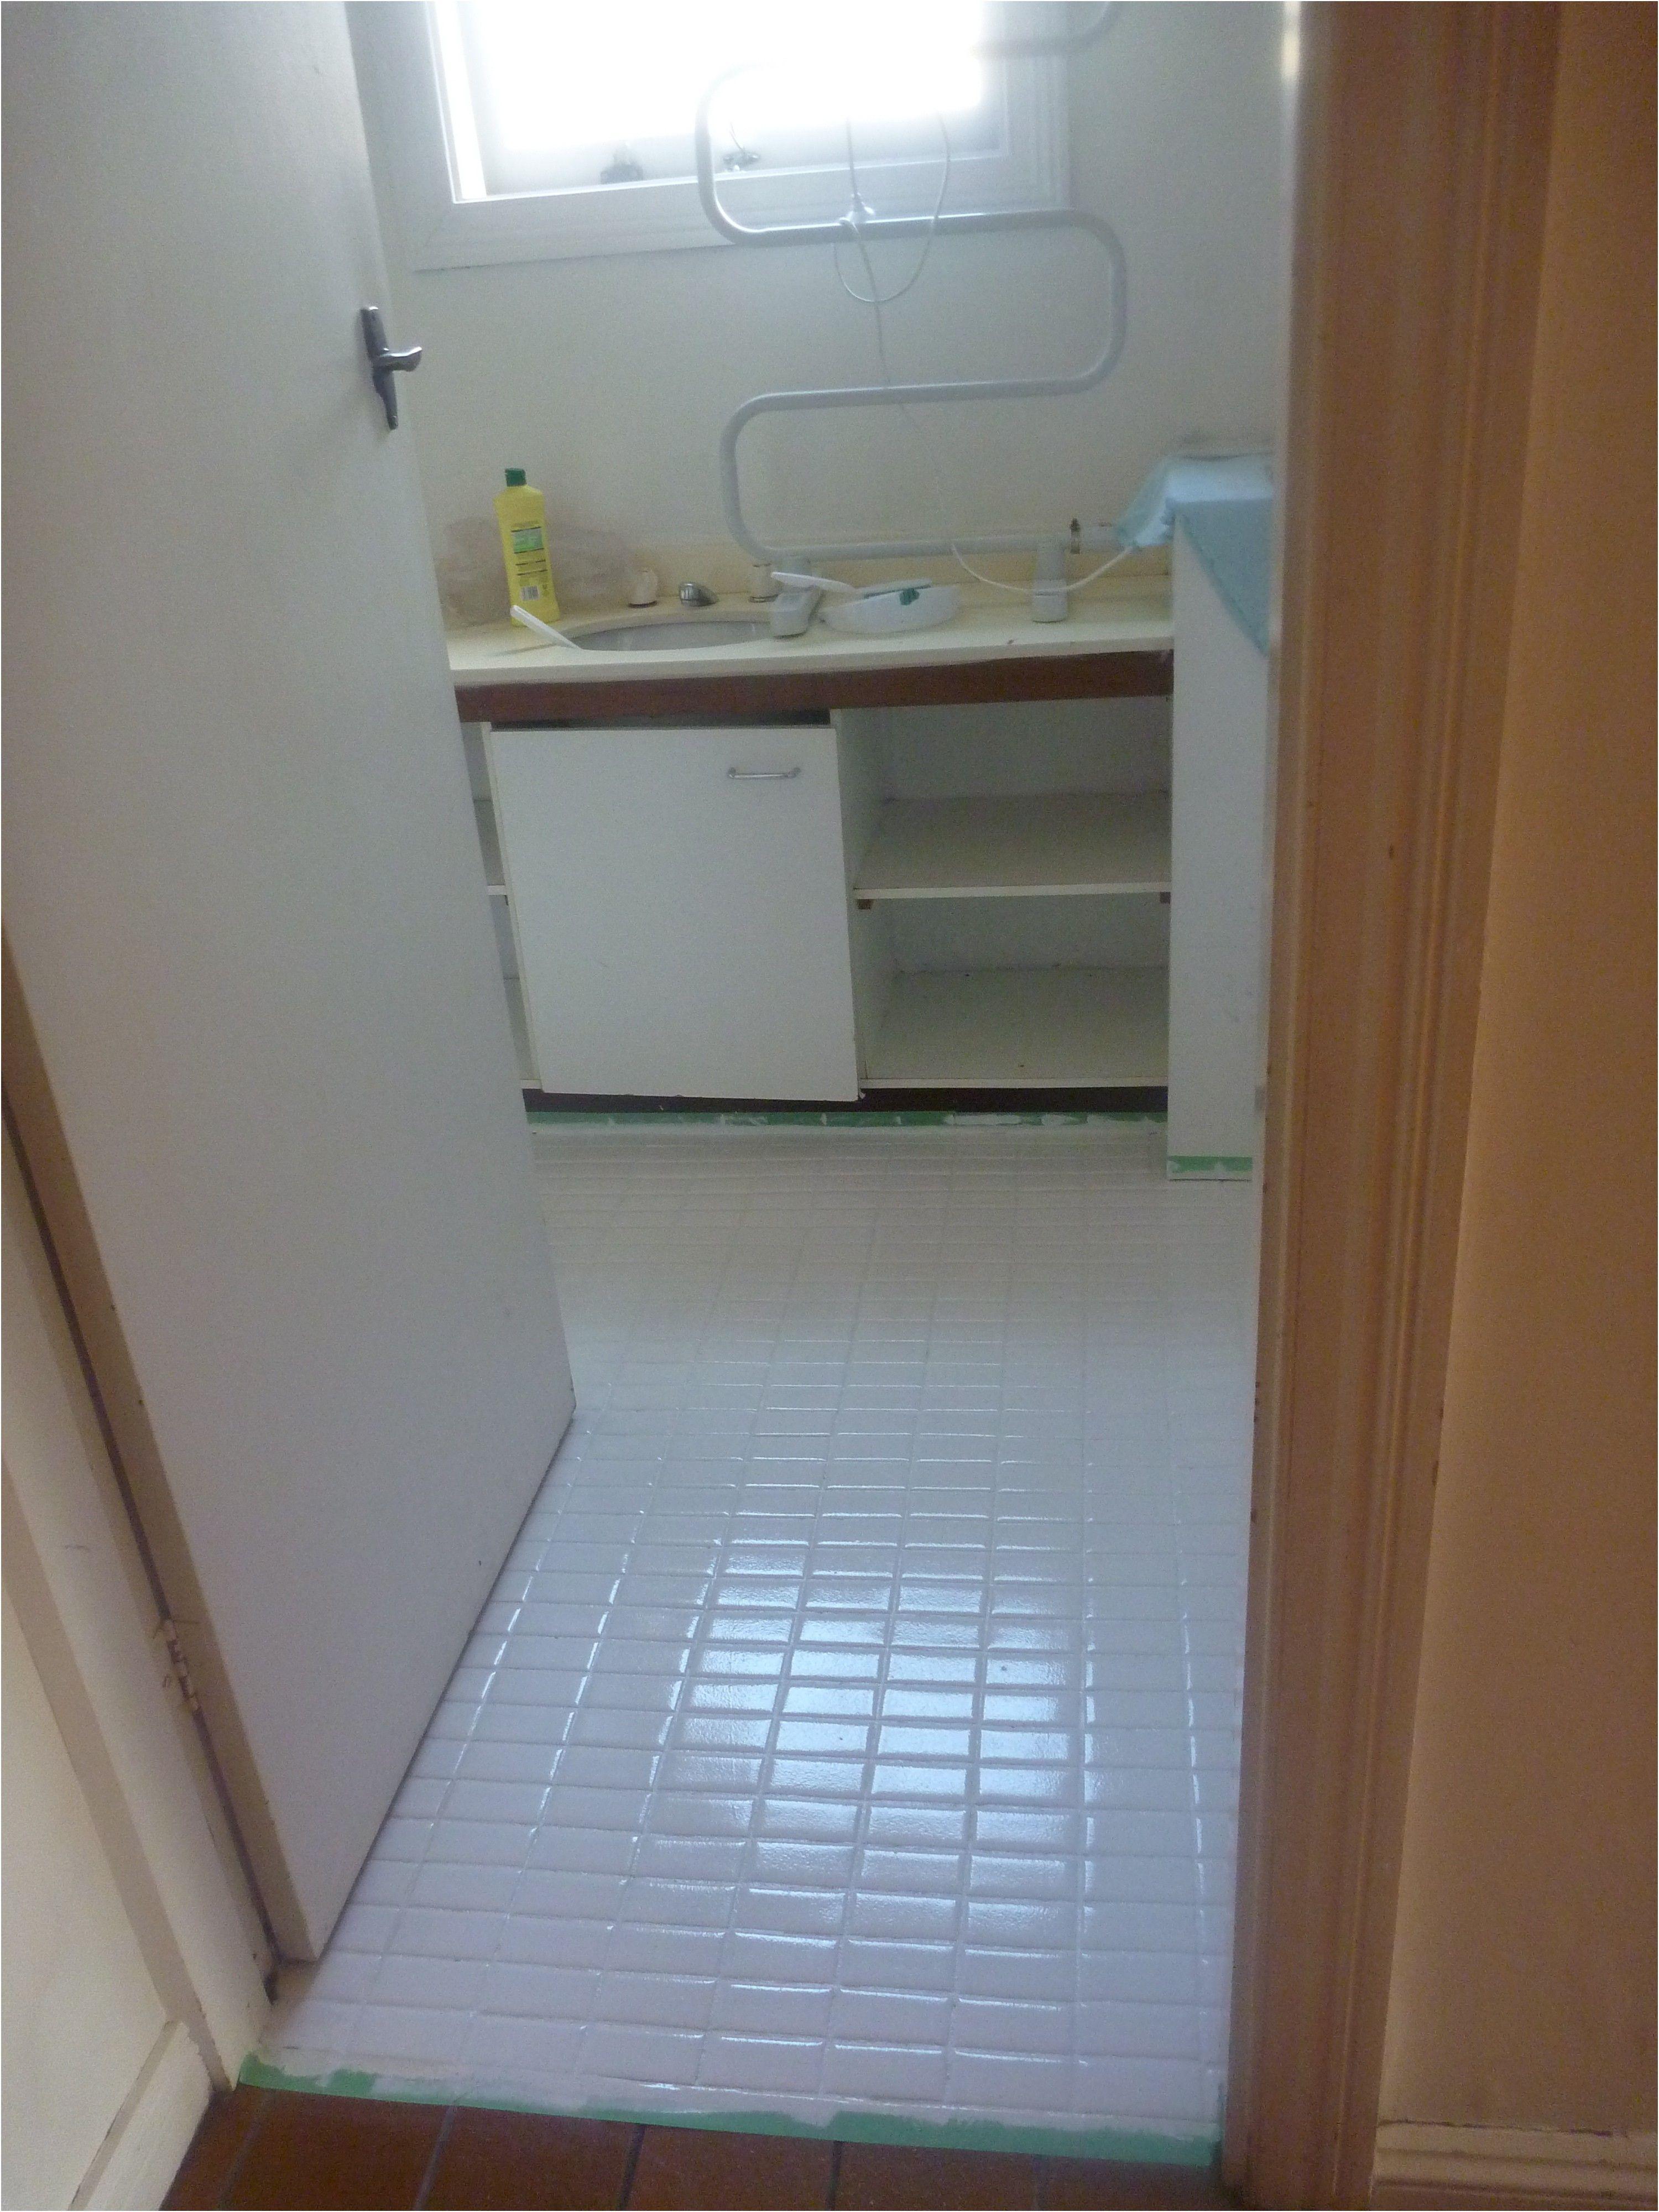 Fashionable can i paint bathroom floor tiles can bathrrom remodel fashionable can i paint bathroom floor tiles can bathrrom remodel from paint for bathroom floor tiles dailygadgetfo Gallery